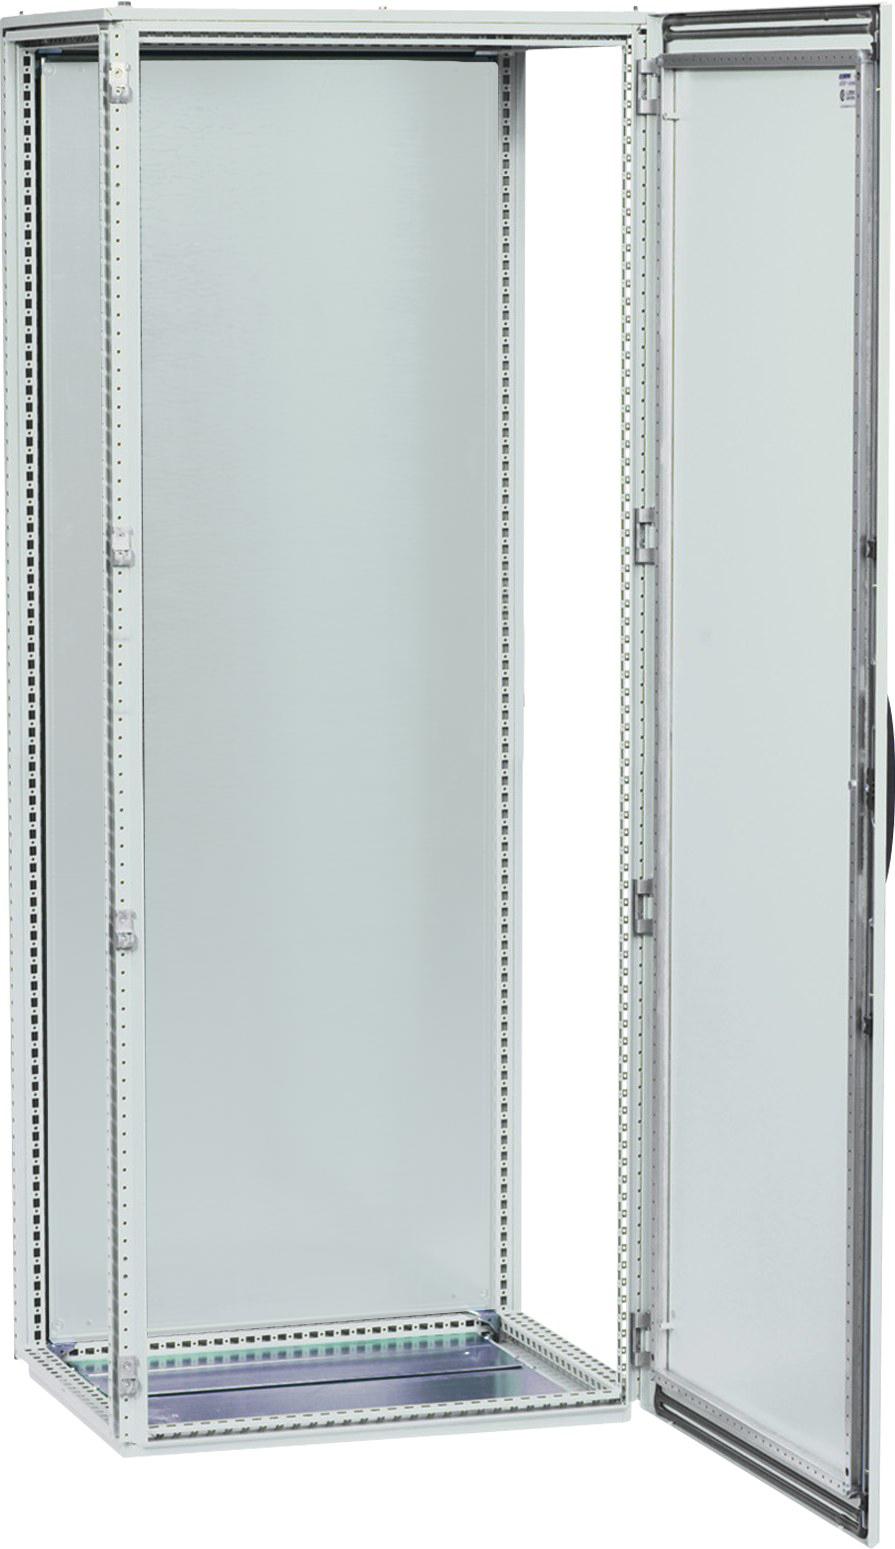 1 Stk Anreihschrank 1-türig, 2000x800x600mm, RAL 7035 AS208061-5